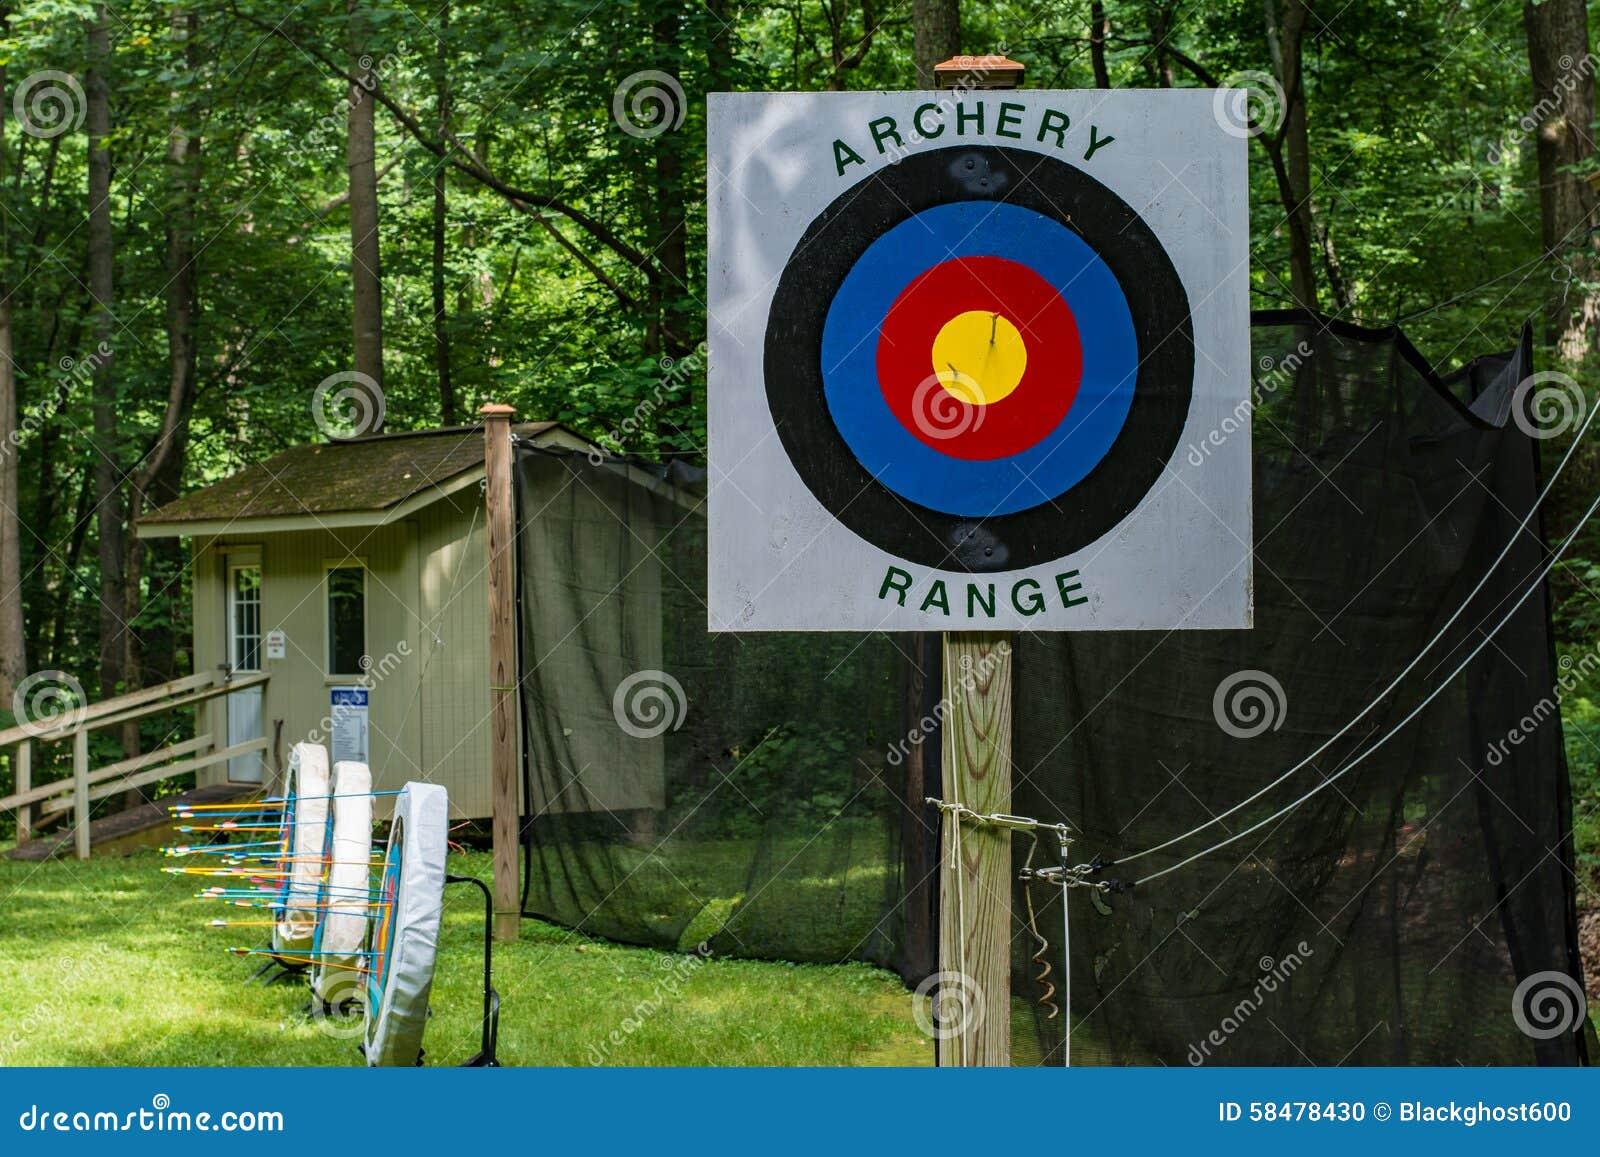 Big Al's Archery